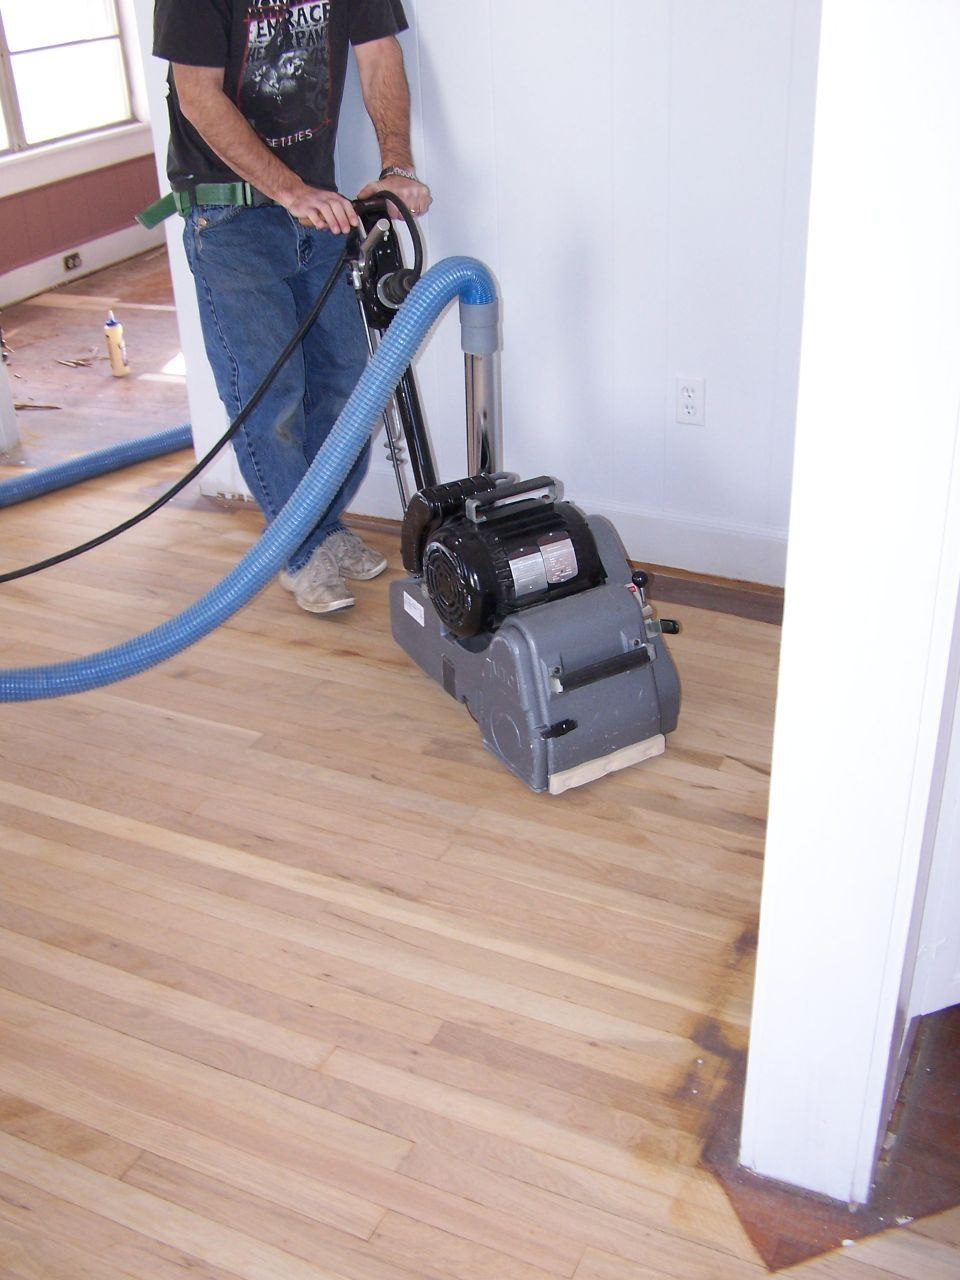 Best Machine For Sanding Hardwood Floors Hardwood Floor Sander